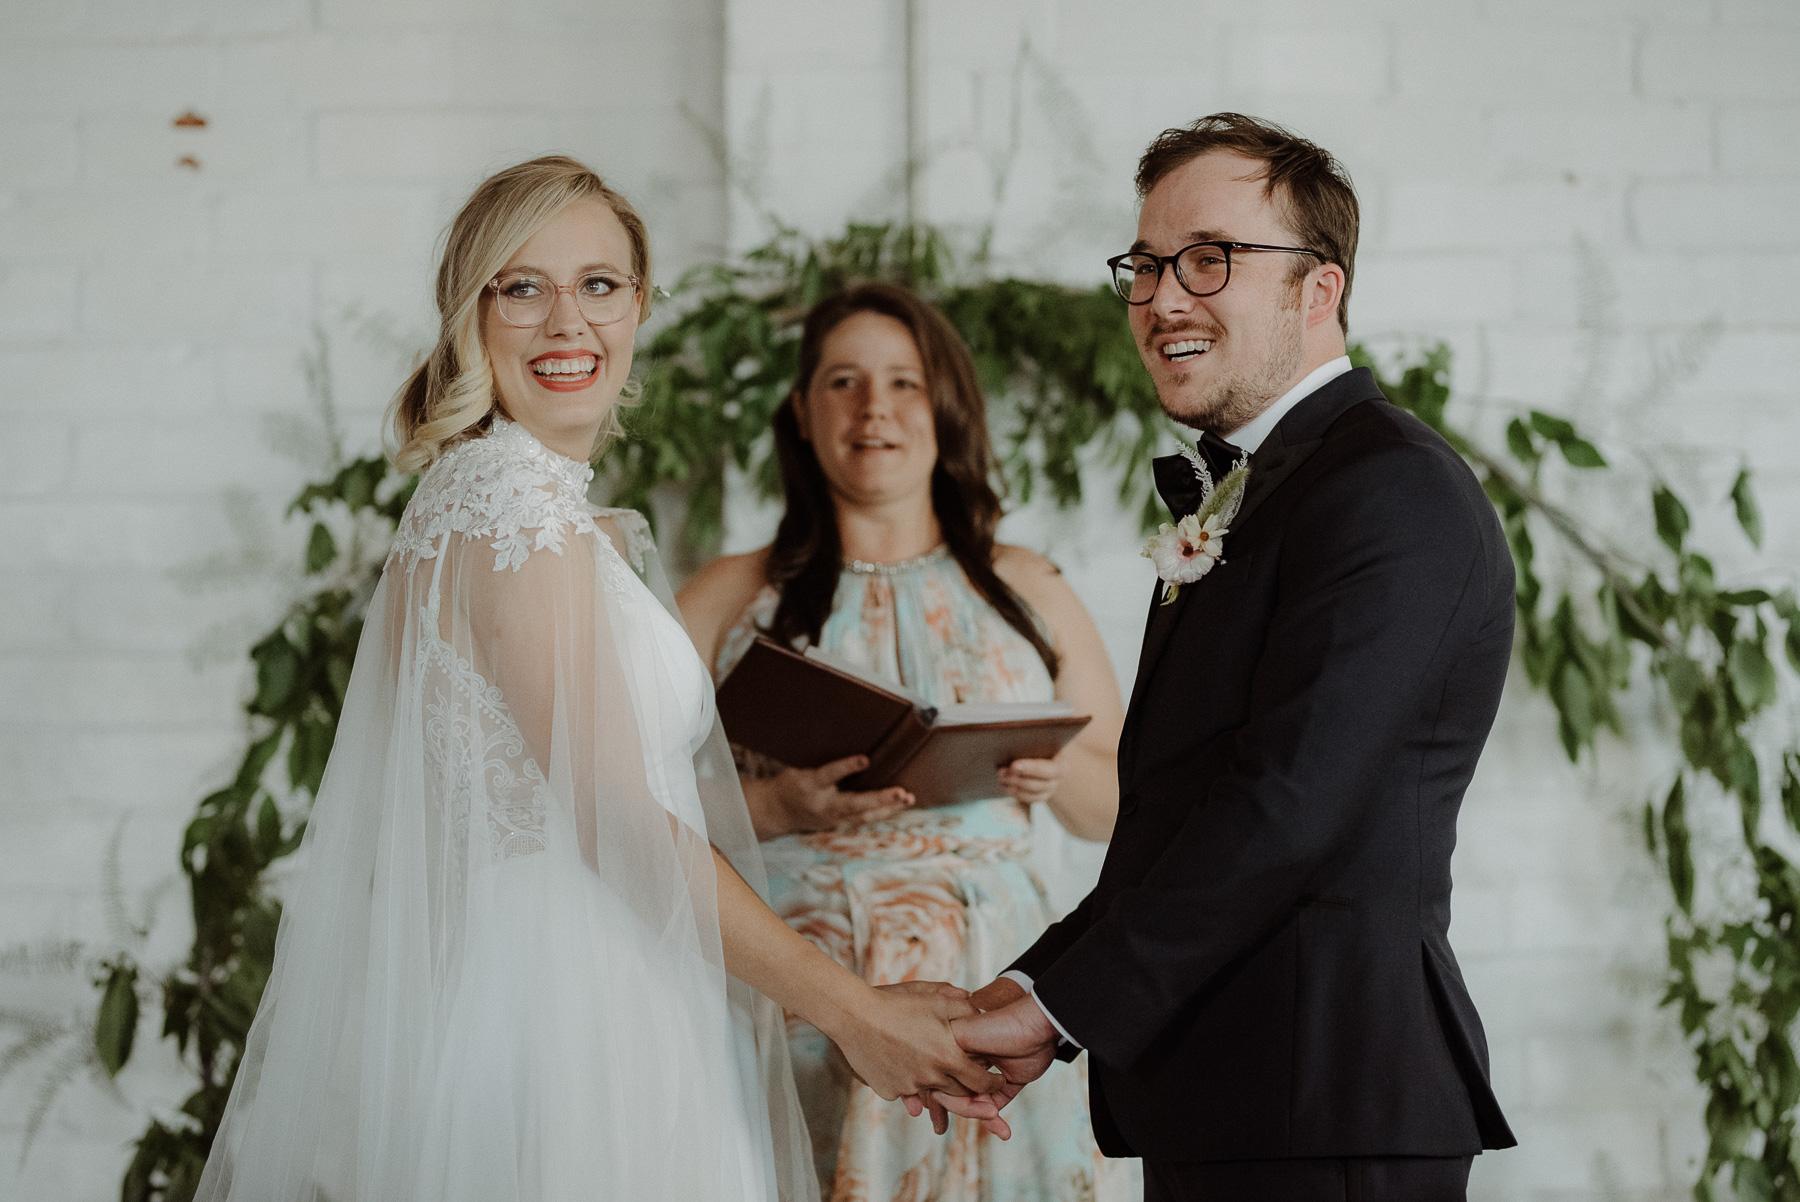 enowen-wedding-photography-mike-anna-suffolk-punch-charlotte (40 of 78).jpg